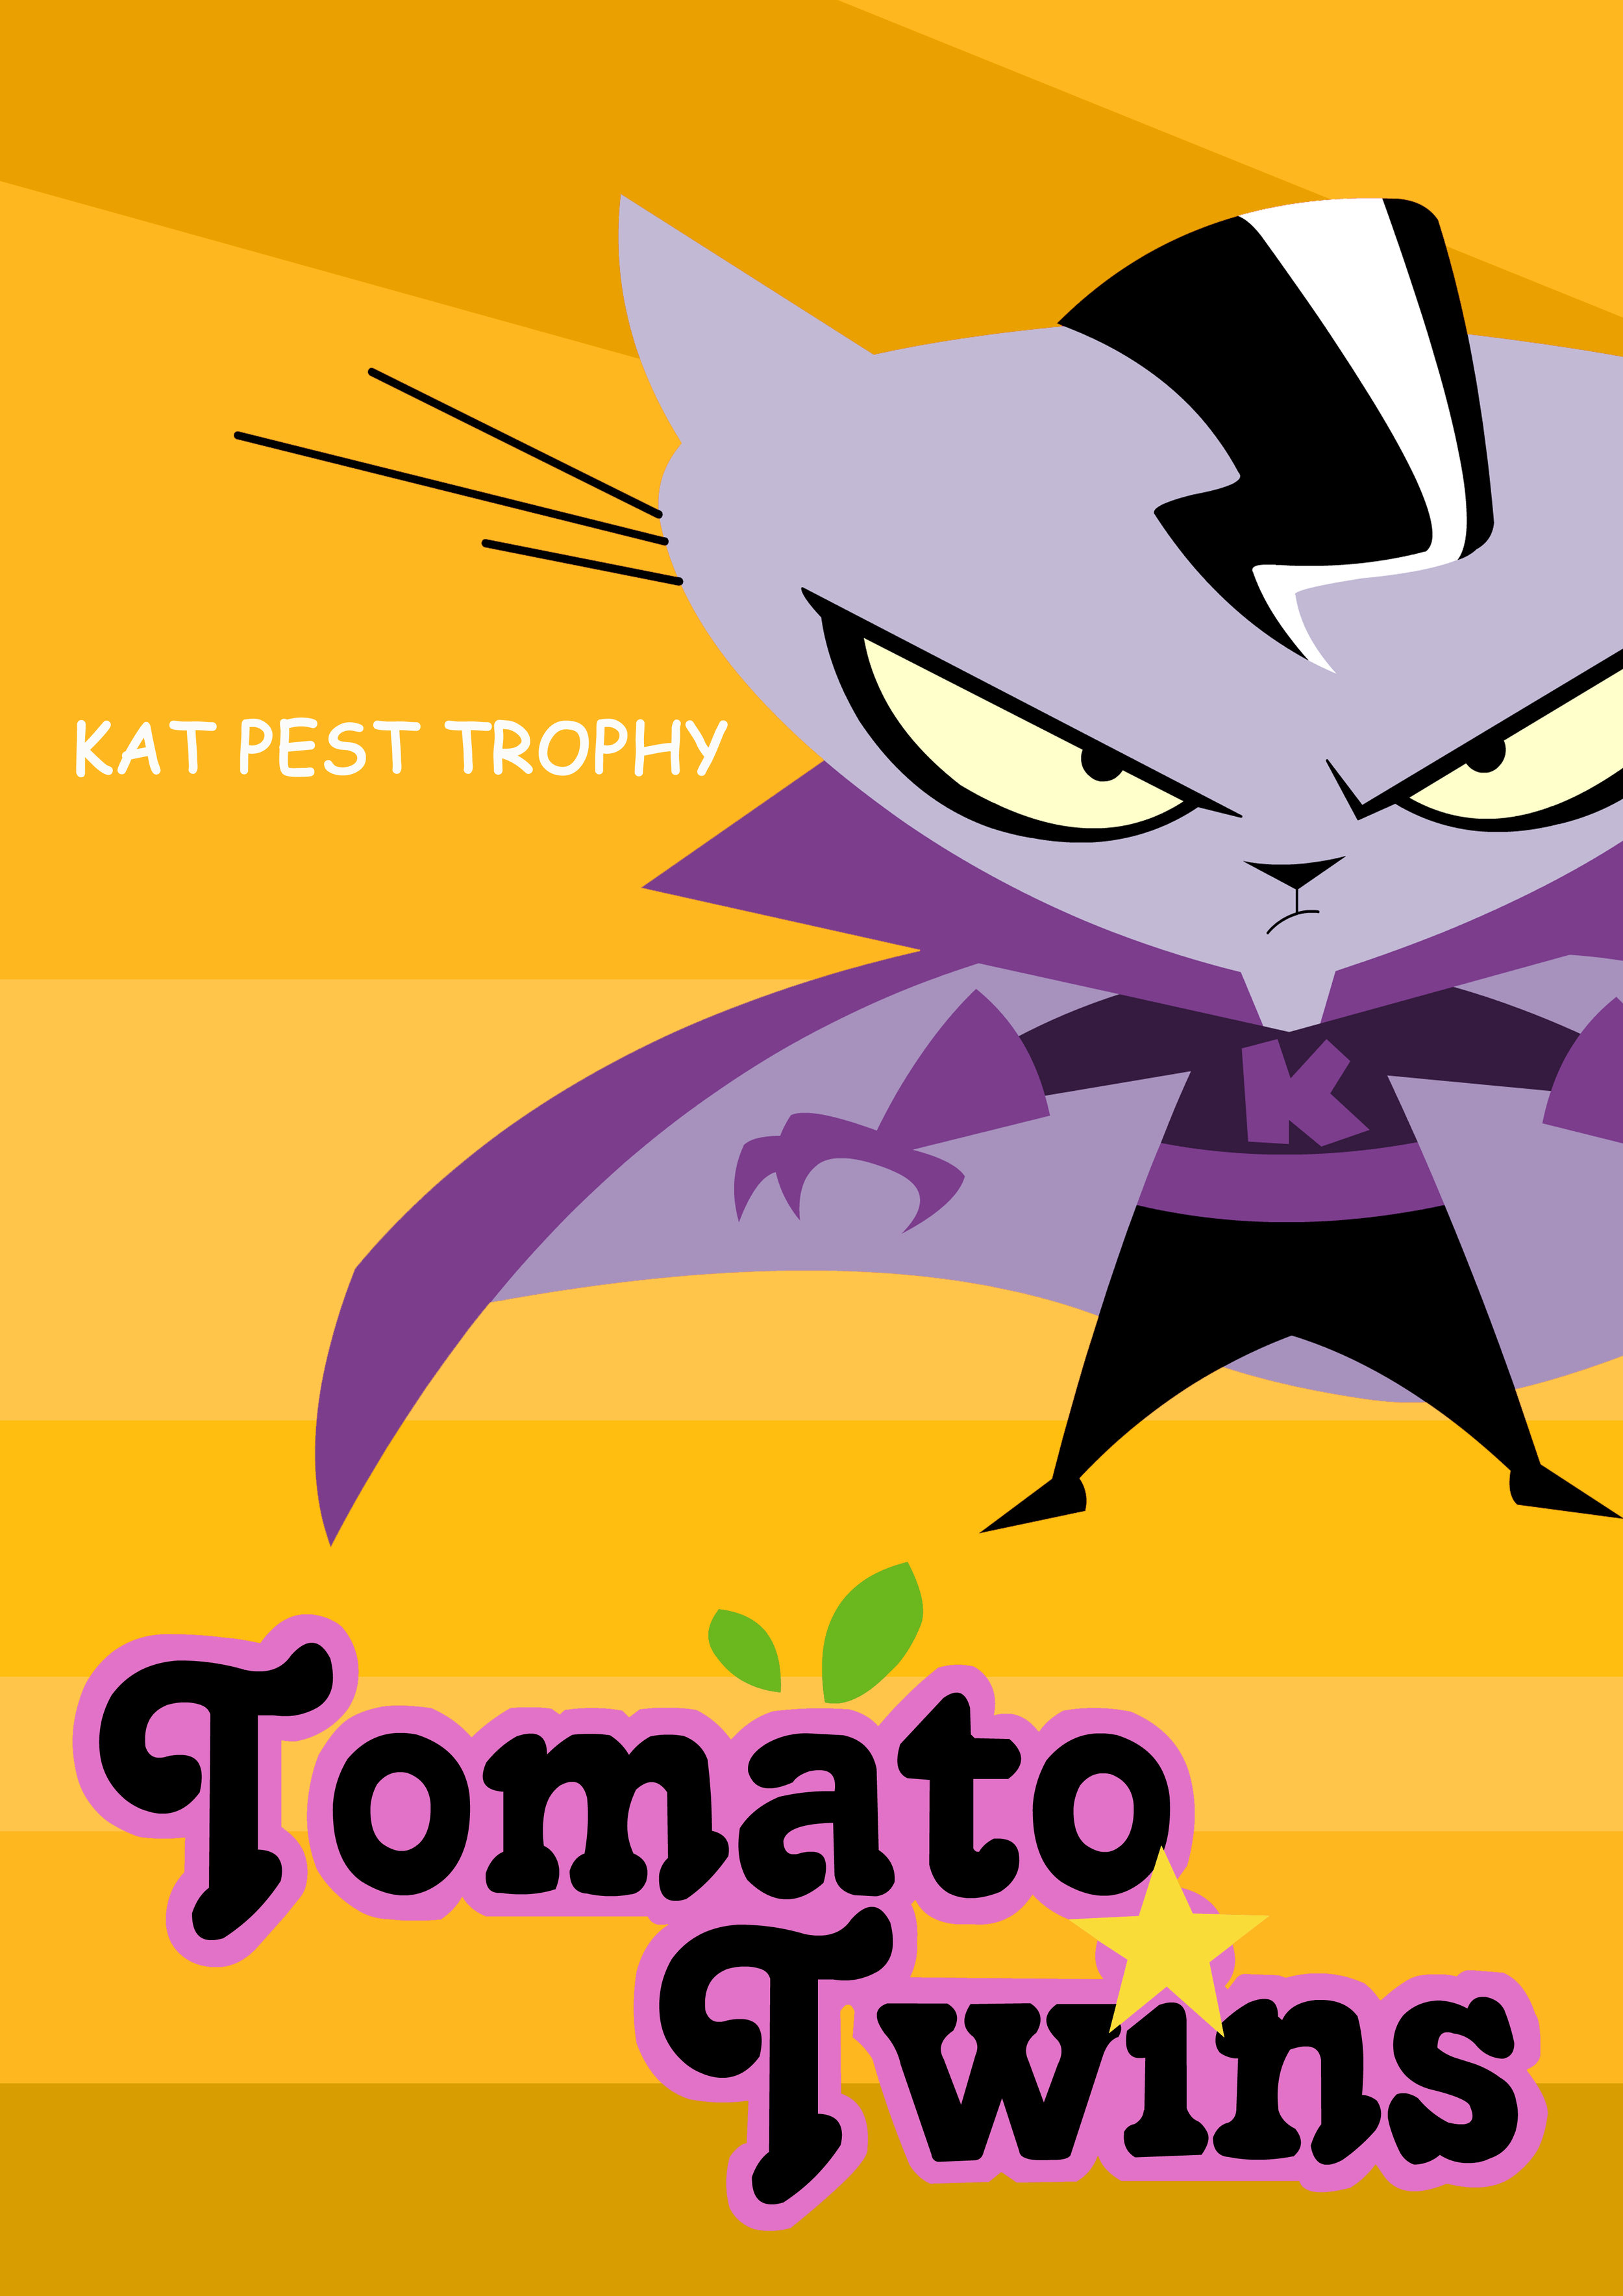 TomatoTwins_Poster_Kat.jpg